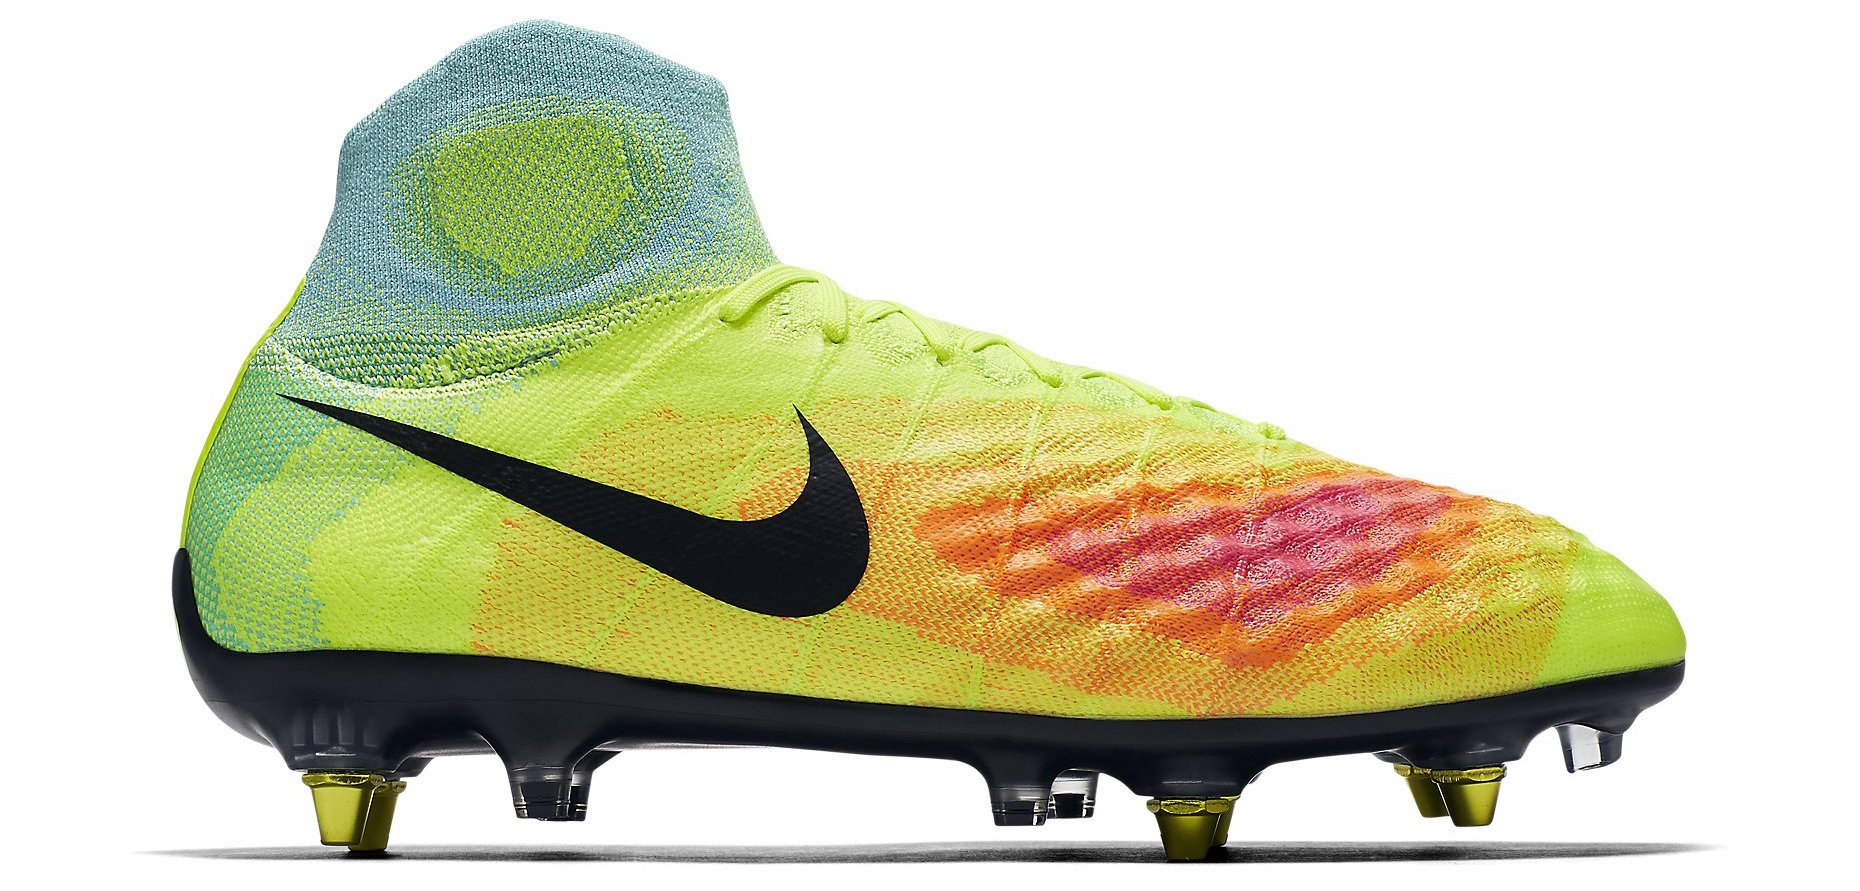 Kopačky Nike Magista Obra Leather SG-PRO Anti Clog Traction